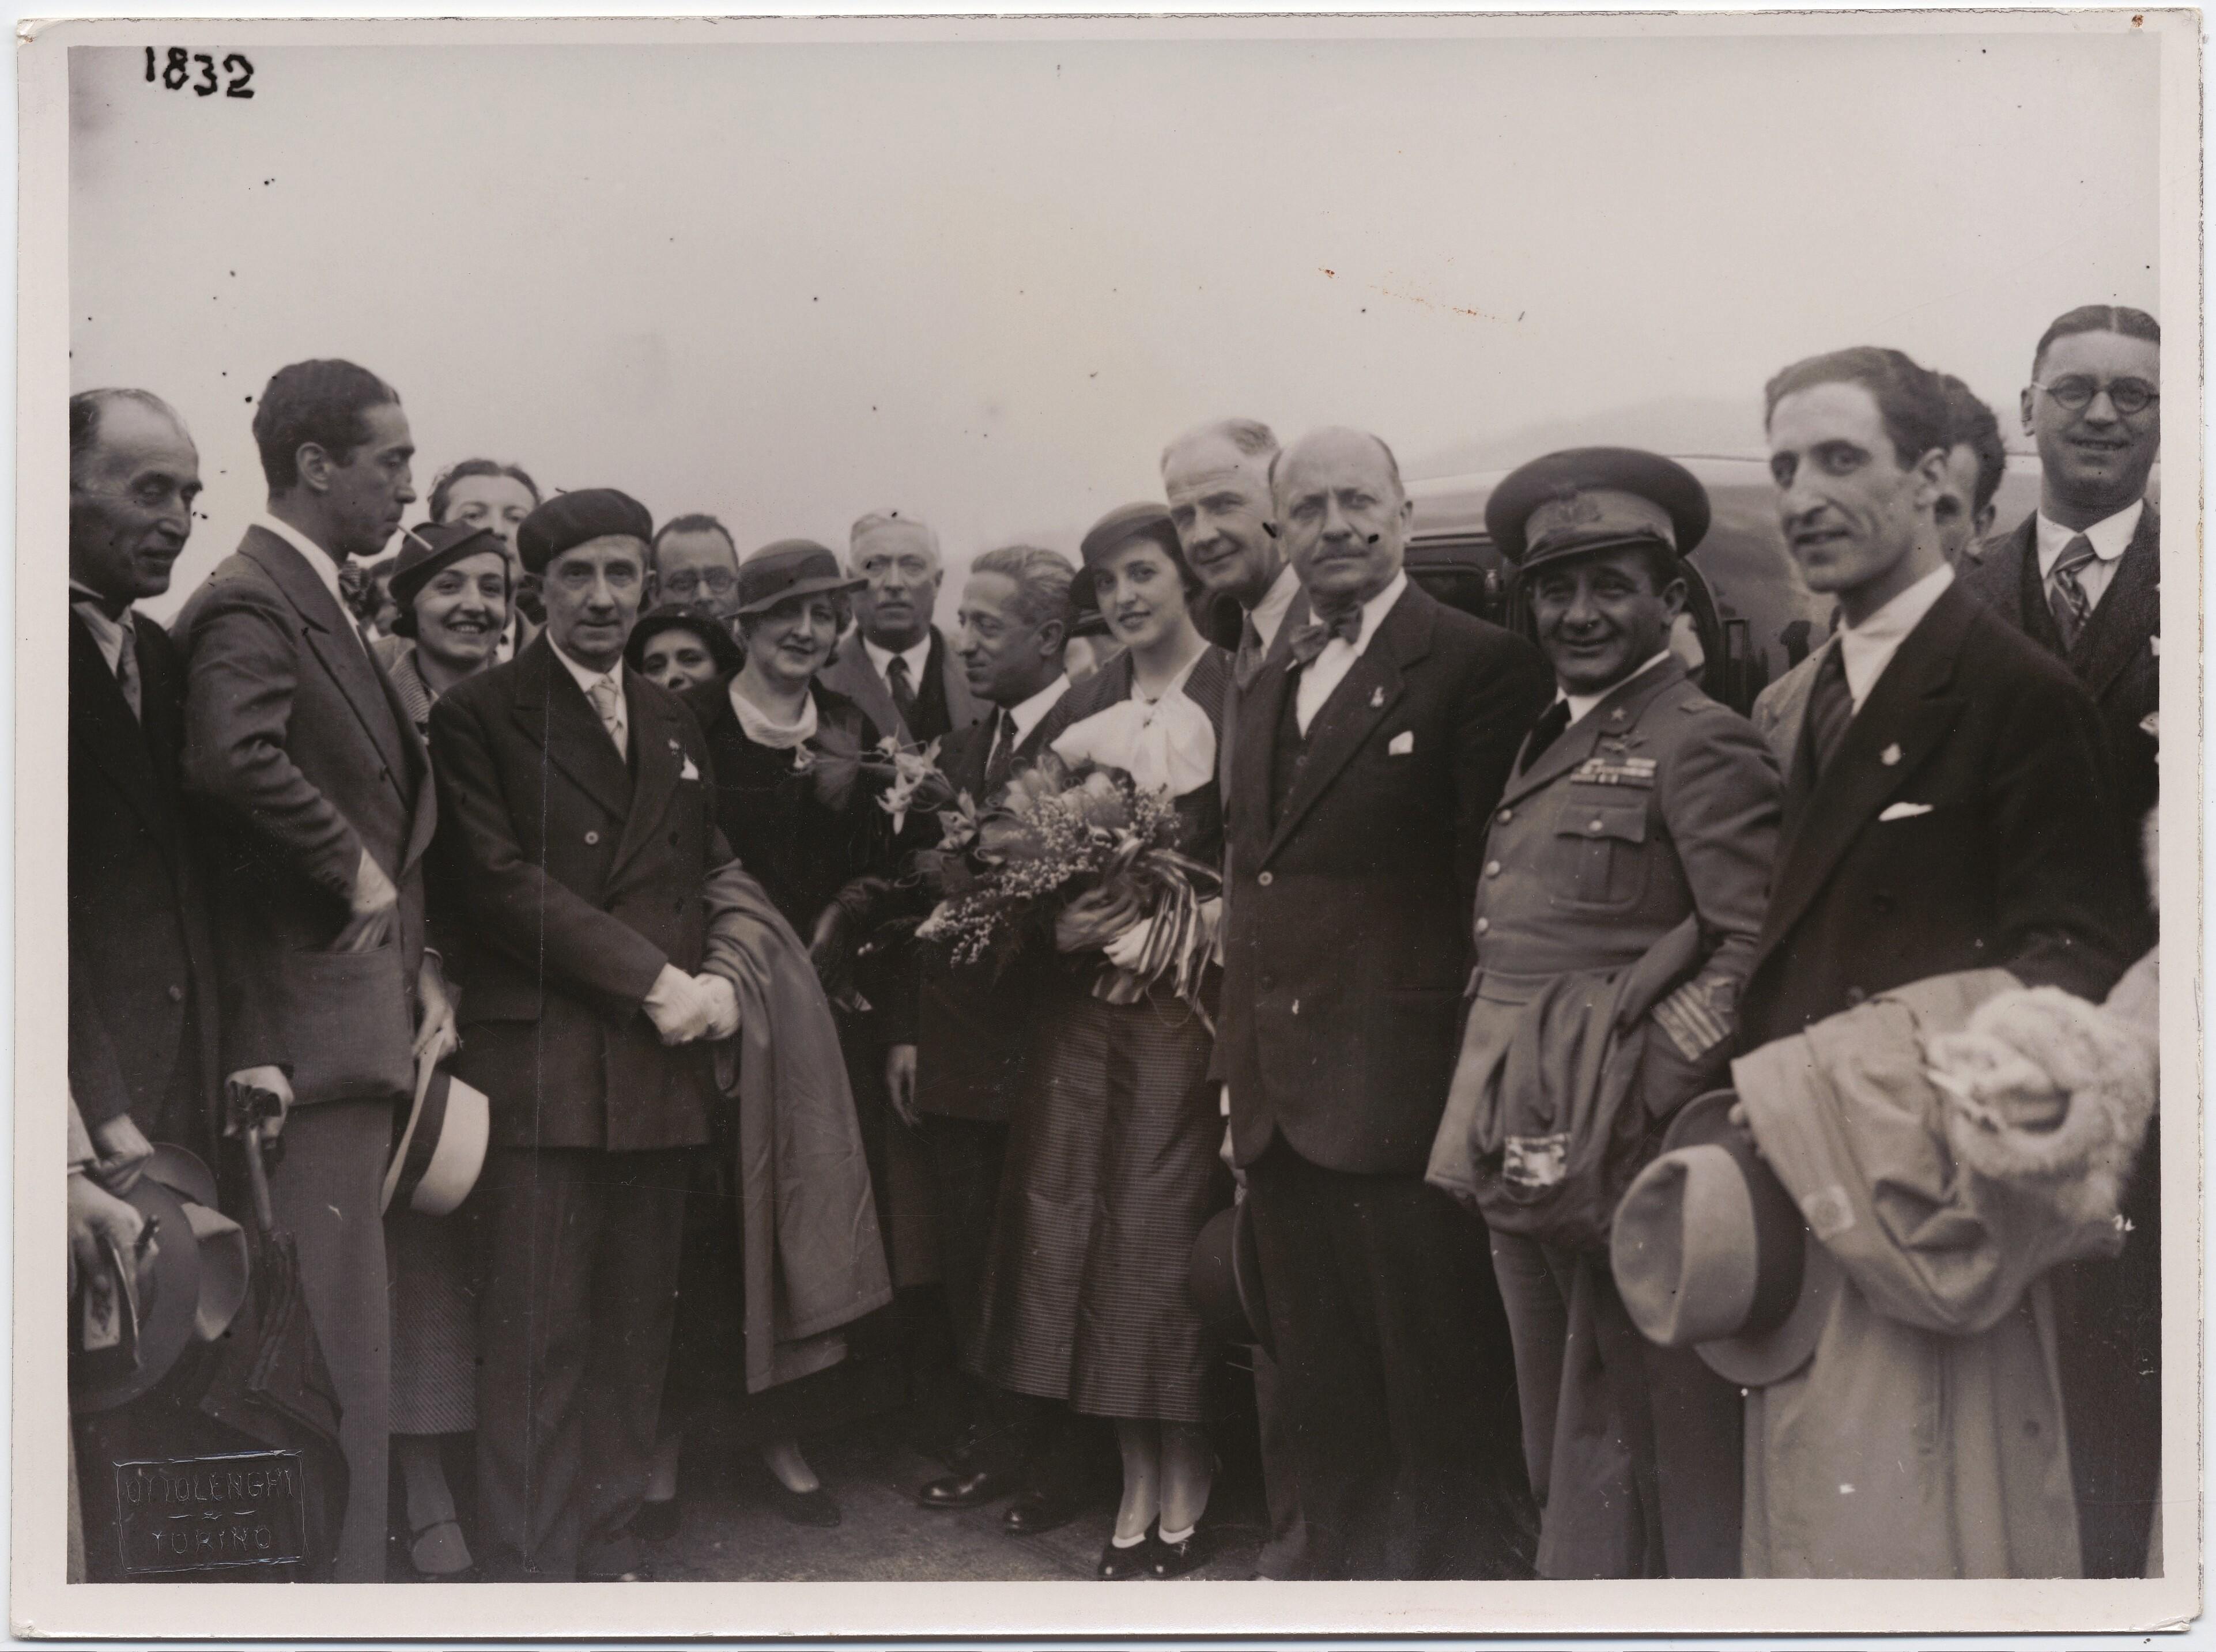 1934. Турин. Филиппо Томмазо Маринетти на Туринской книжной ярмарке.